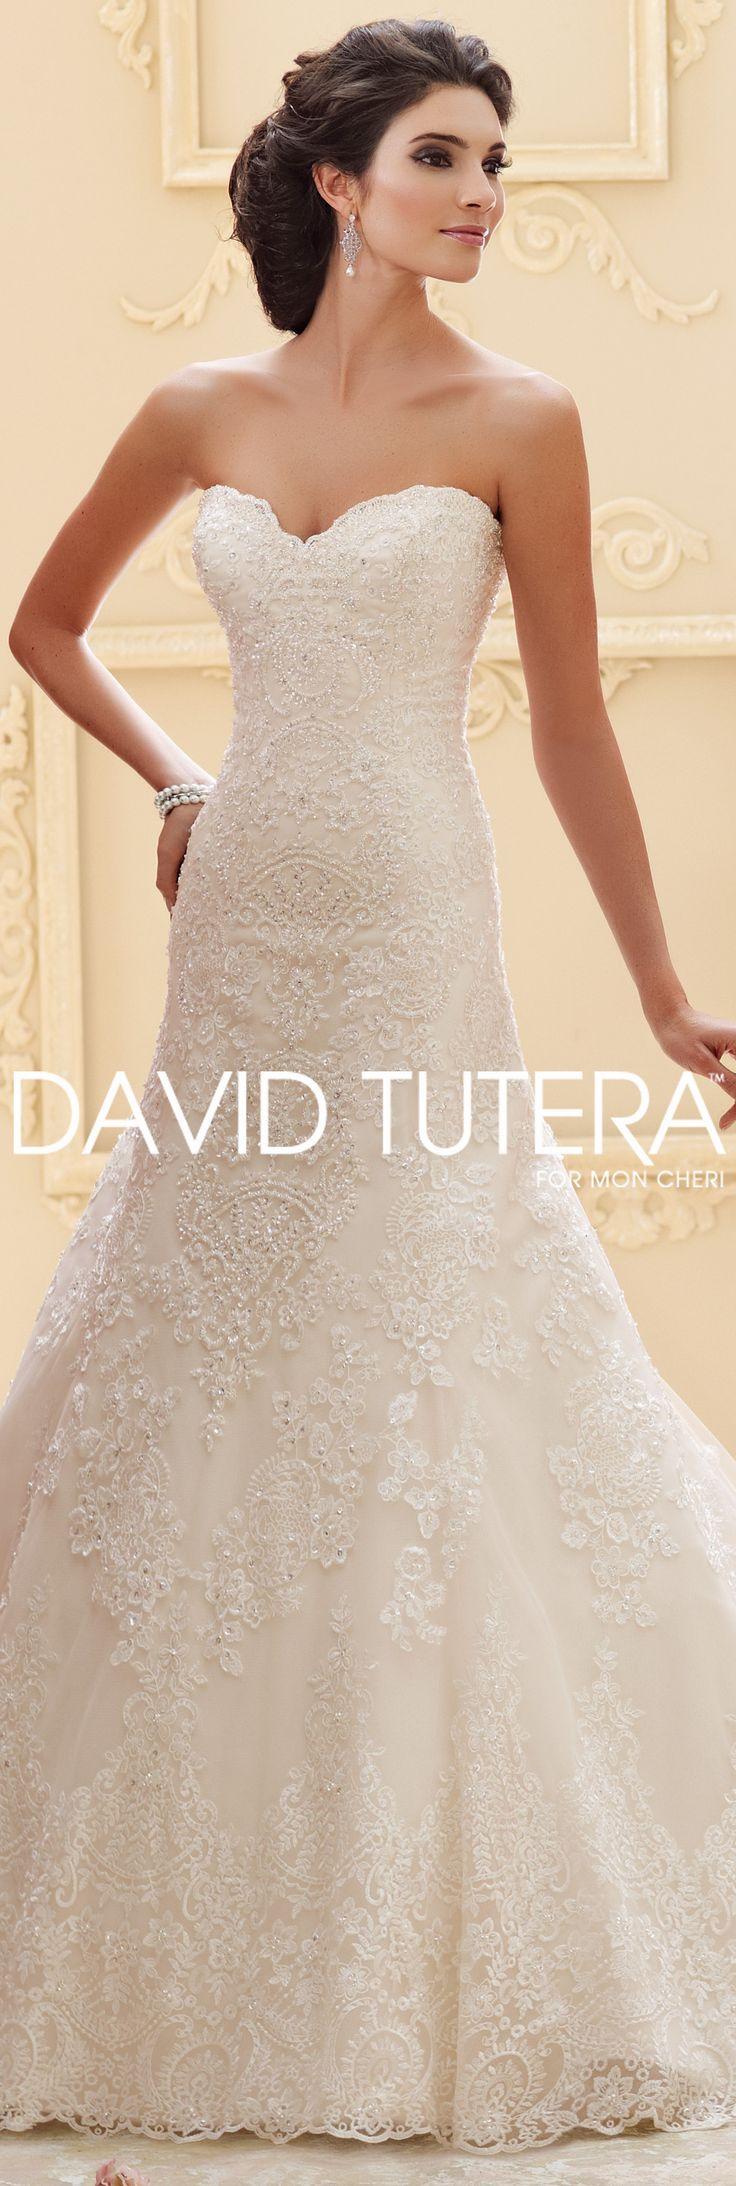 The David Tutera for Mon Cheri Fall 2015 Wedding Gown Collection - Style No. 215265 Katharine #laceweddingdresses